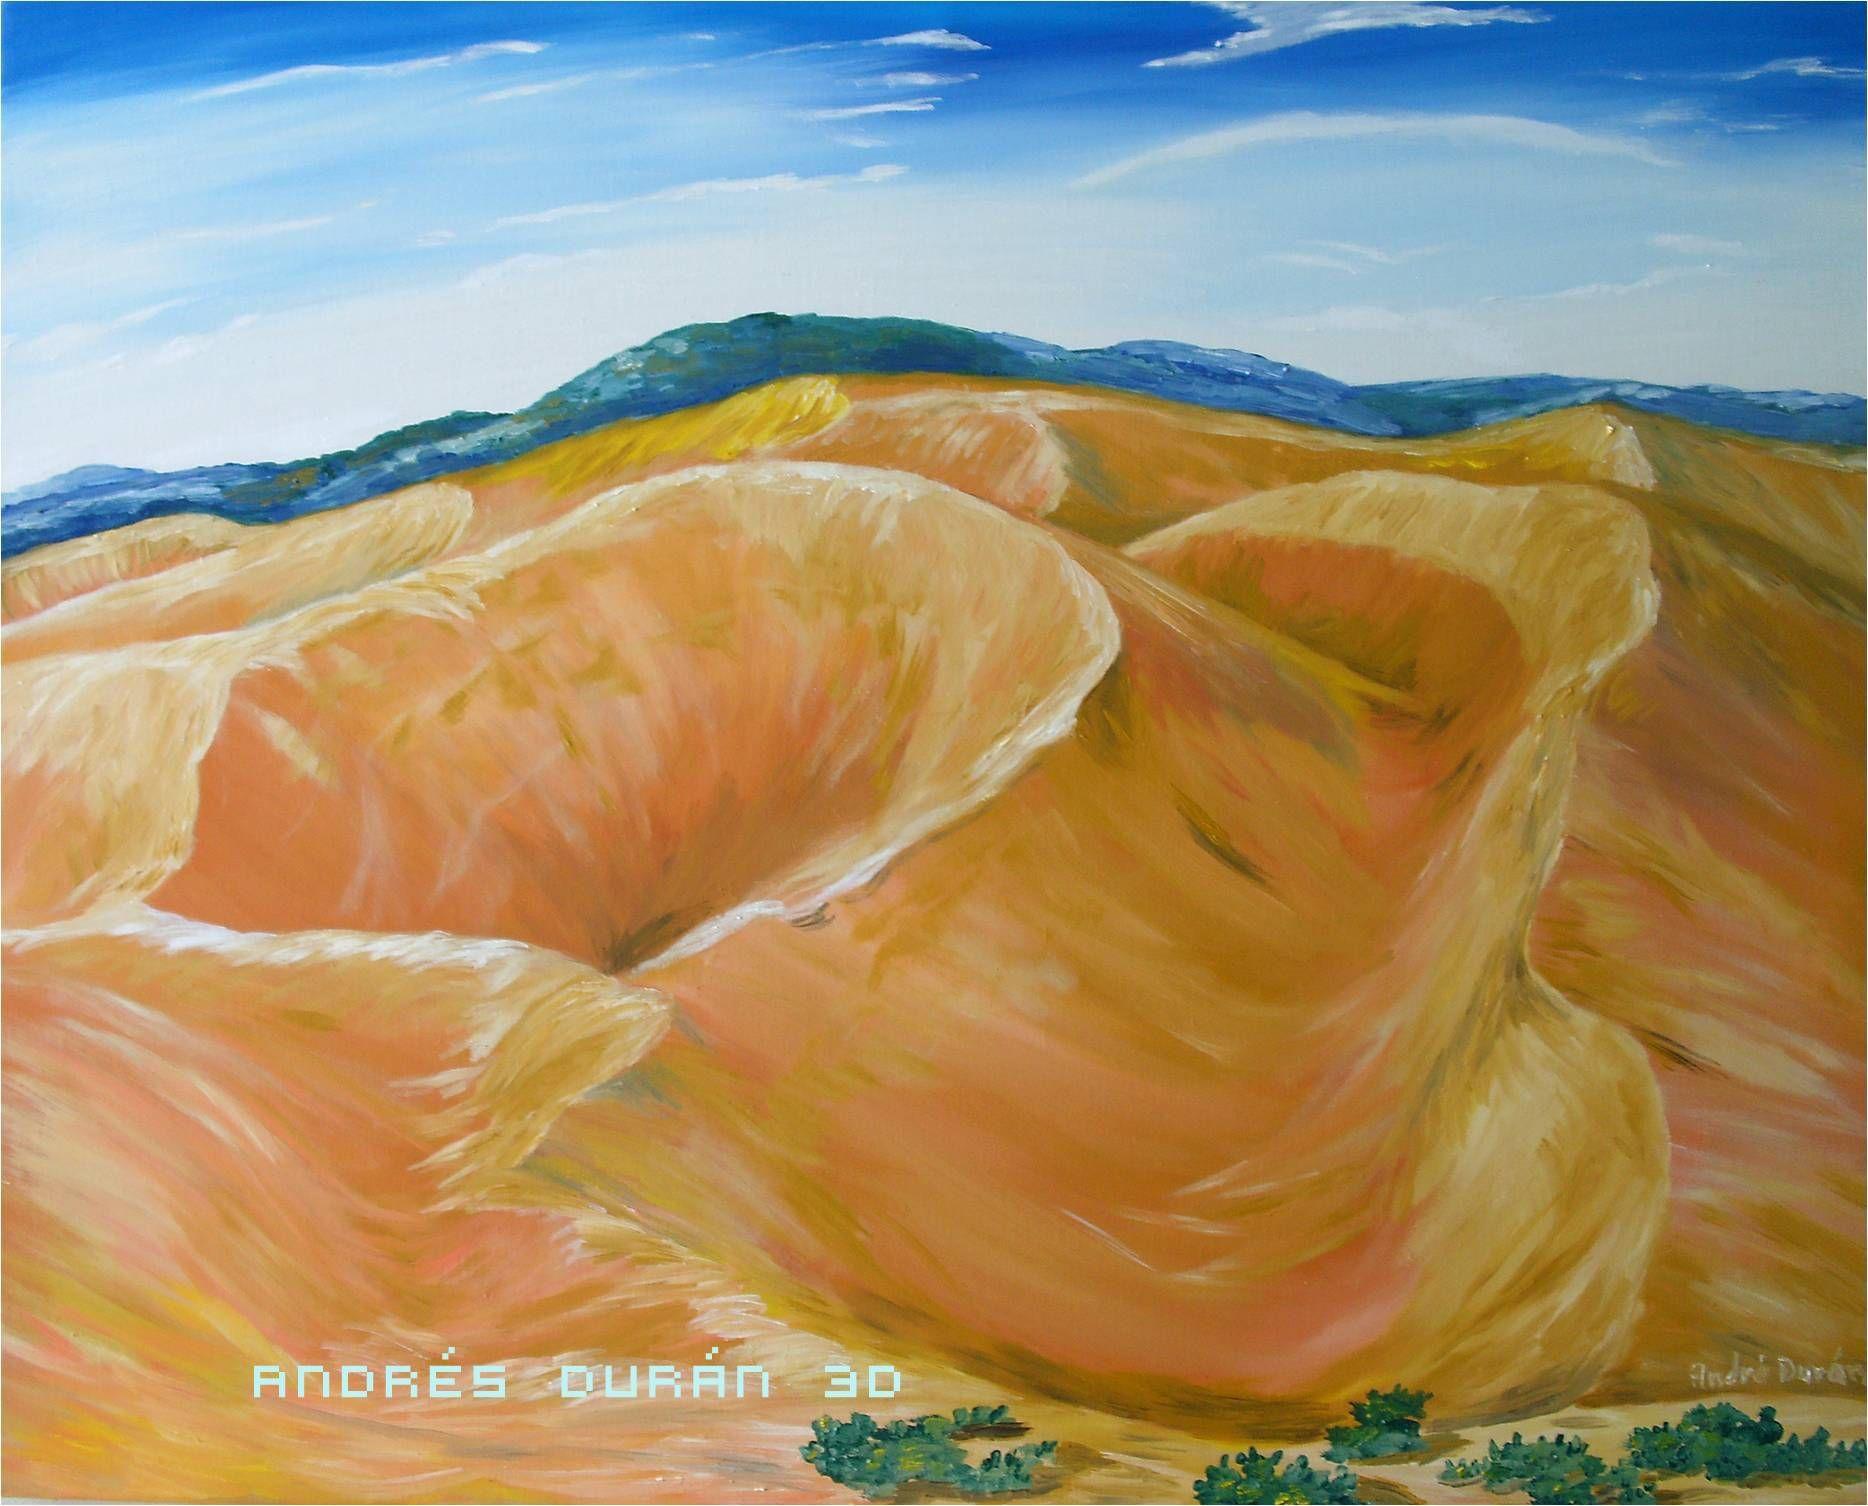 salto angel pintura oleo sobre tela 102cm x 82cm pinturas médanos de coro pintura oleo sobre tela 102cm x 82cm